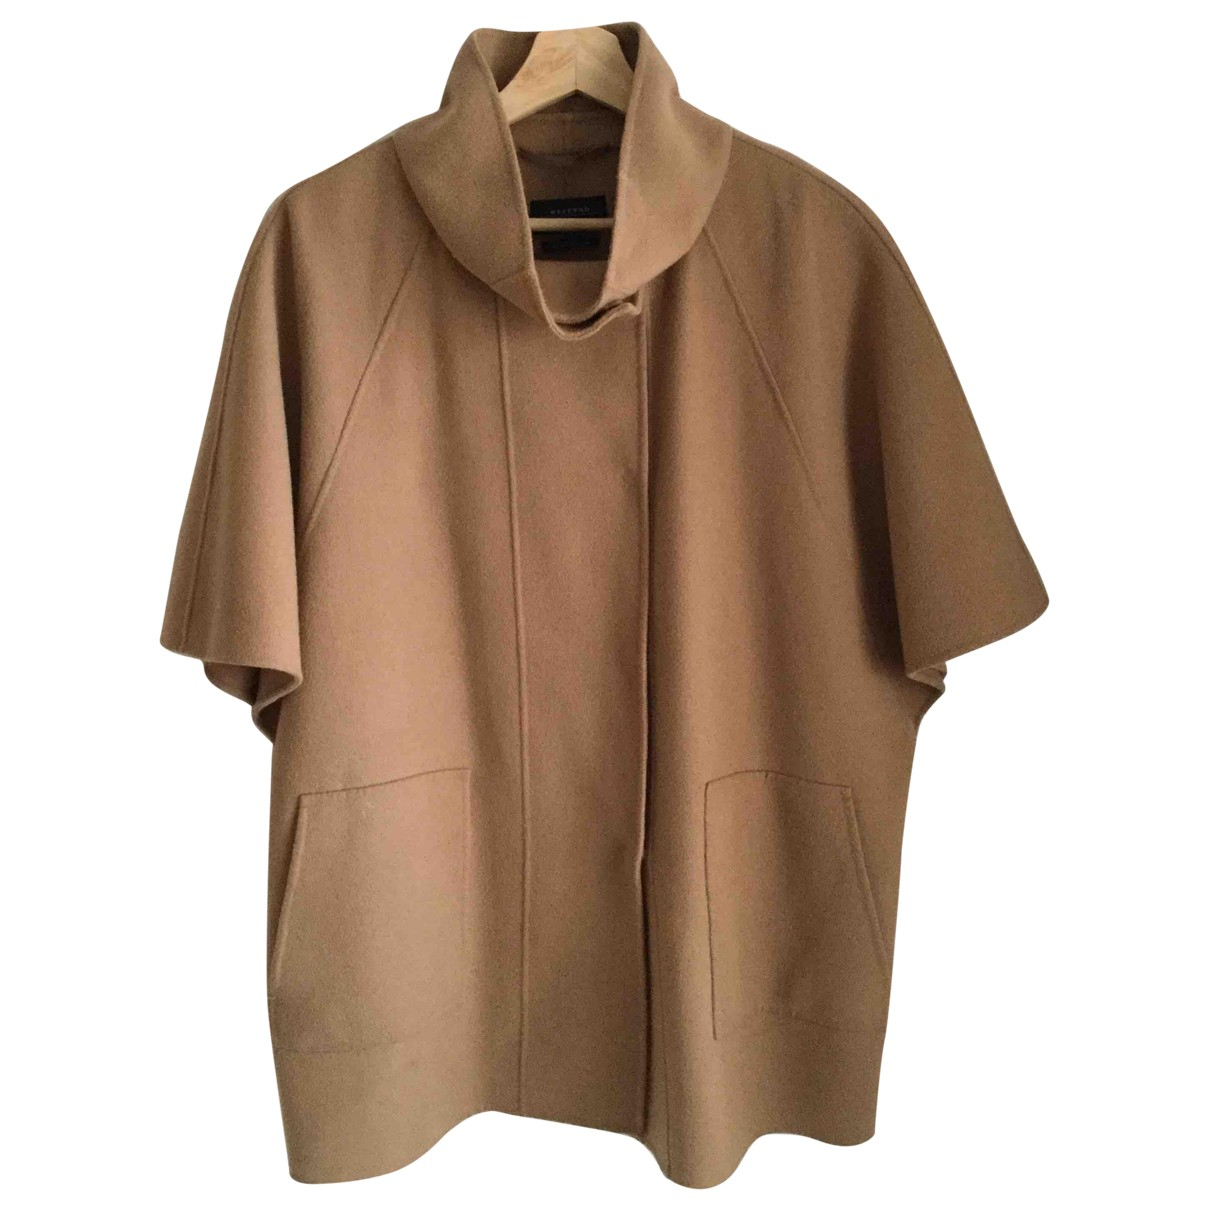 Max Mara \N Camel Wool coat for Women 40 IT